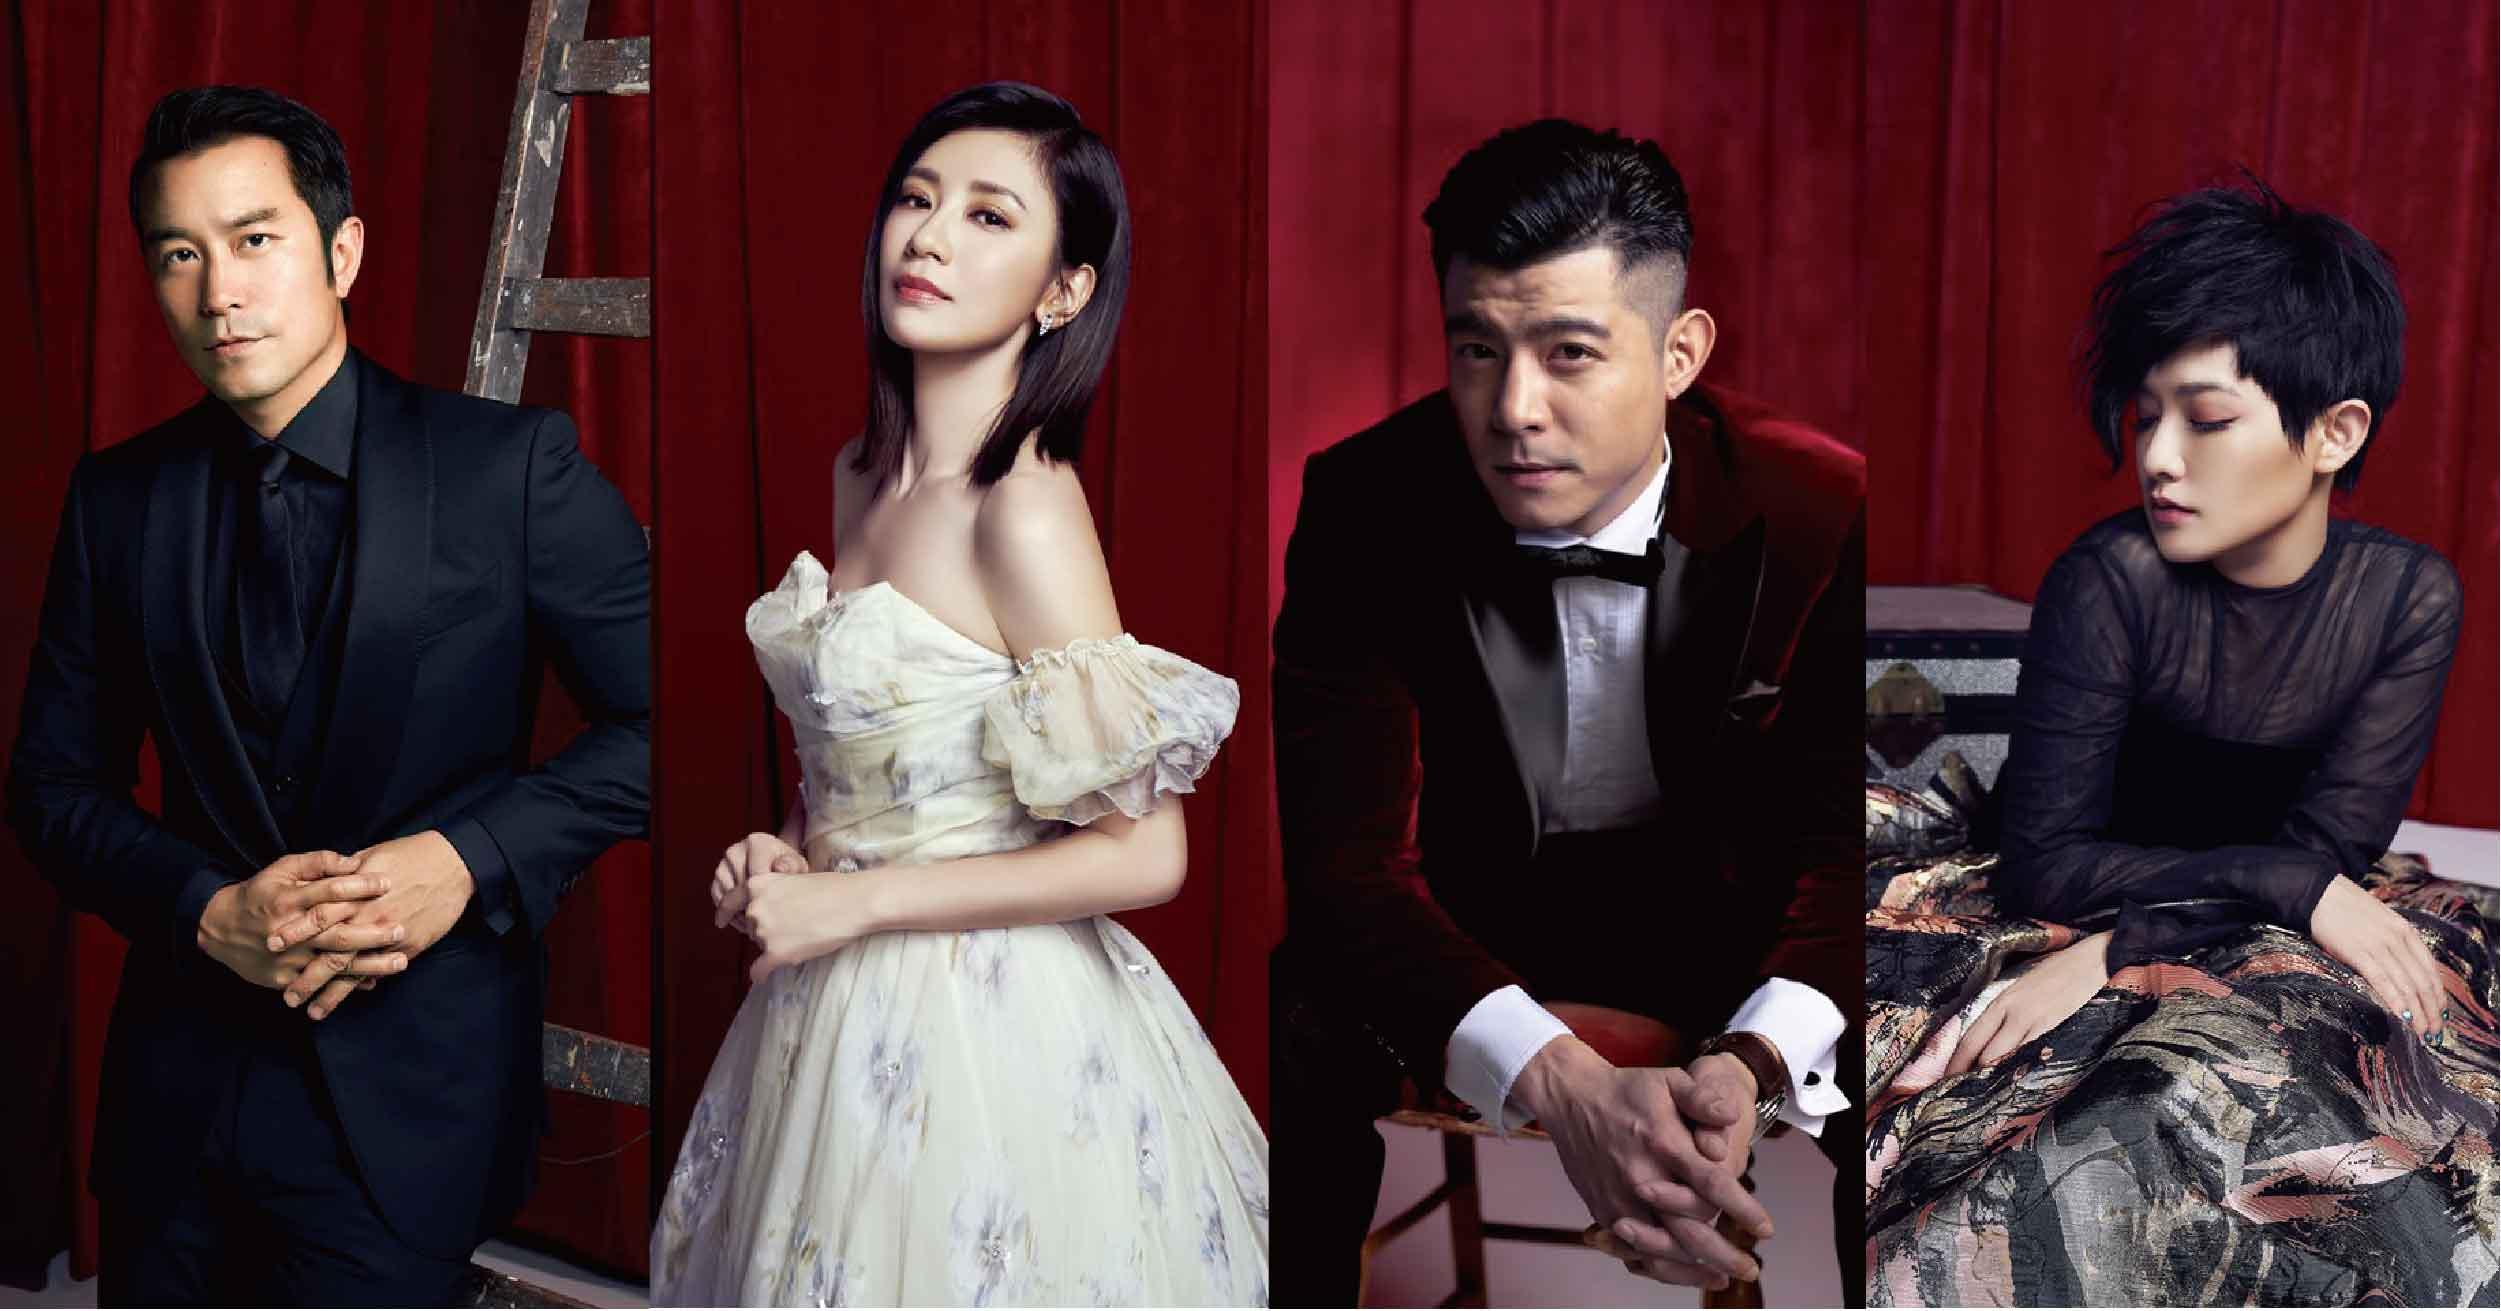 Netflix優質華語原創影集《罪夢者》即將開播!賈靜雯、張孝全、范曉萱講述黑幫題材